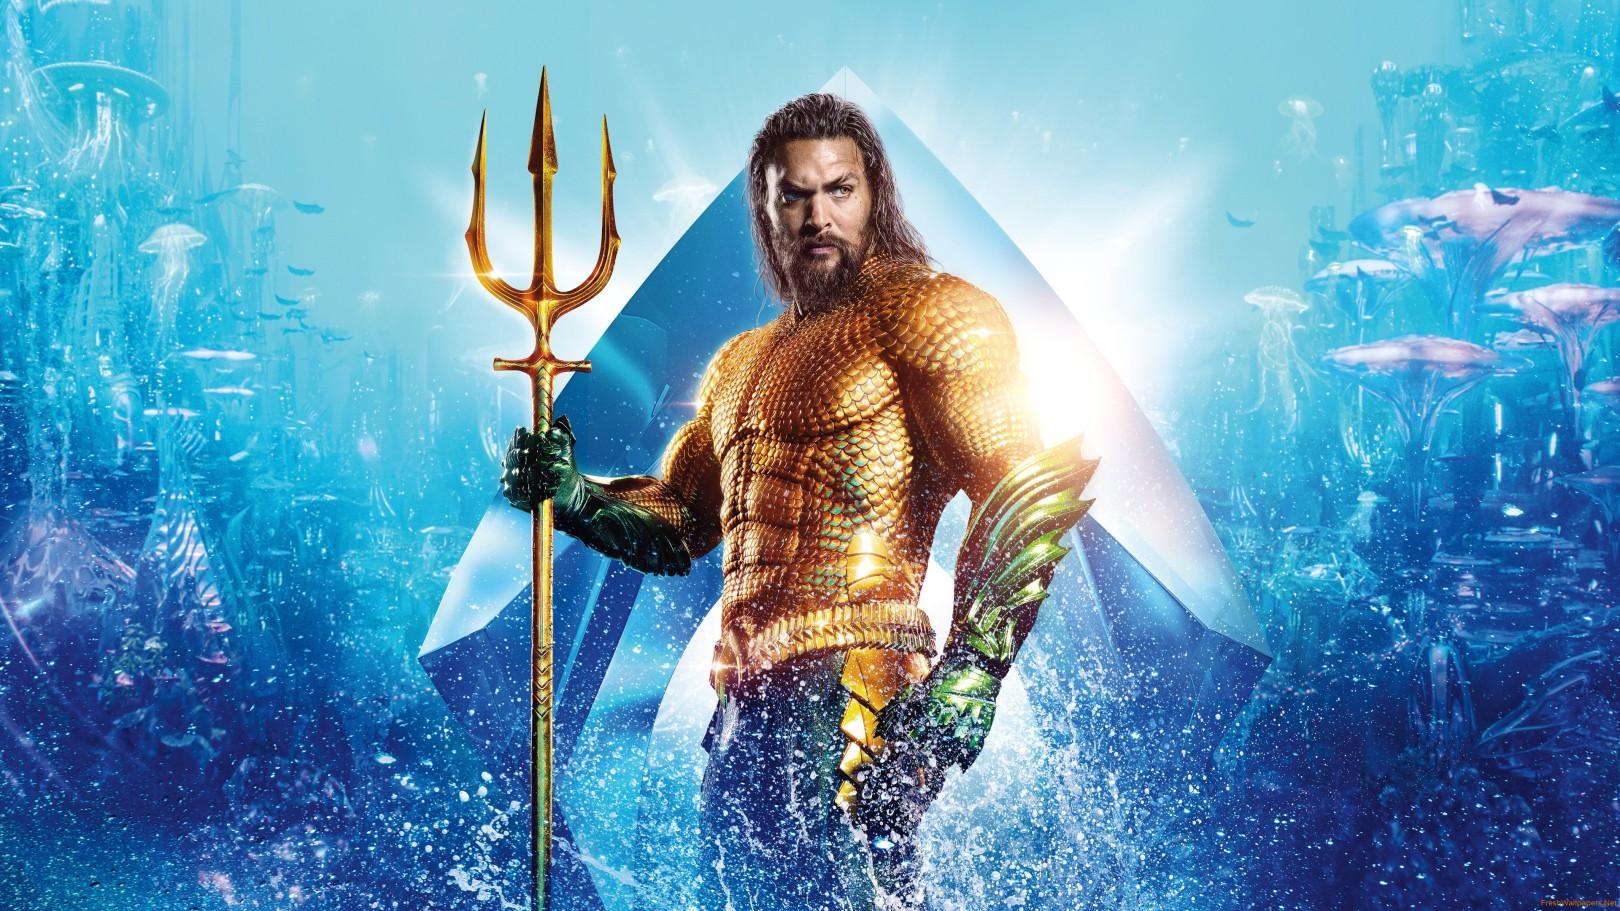 Aquaman Breaks the $200 Million Domestic Barrier Surpassing Wonder Woman